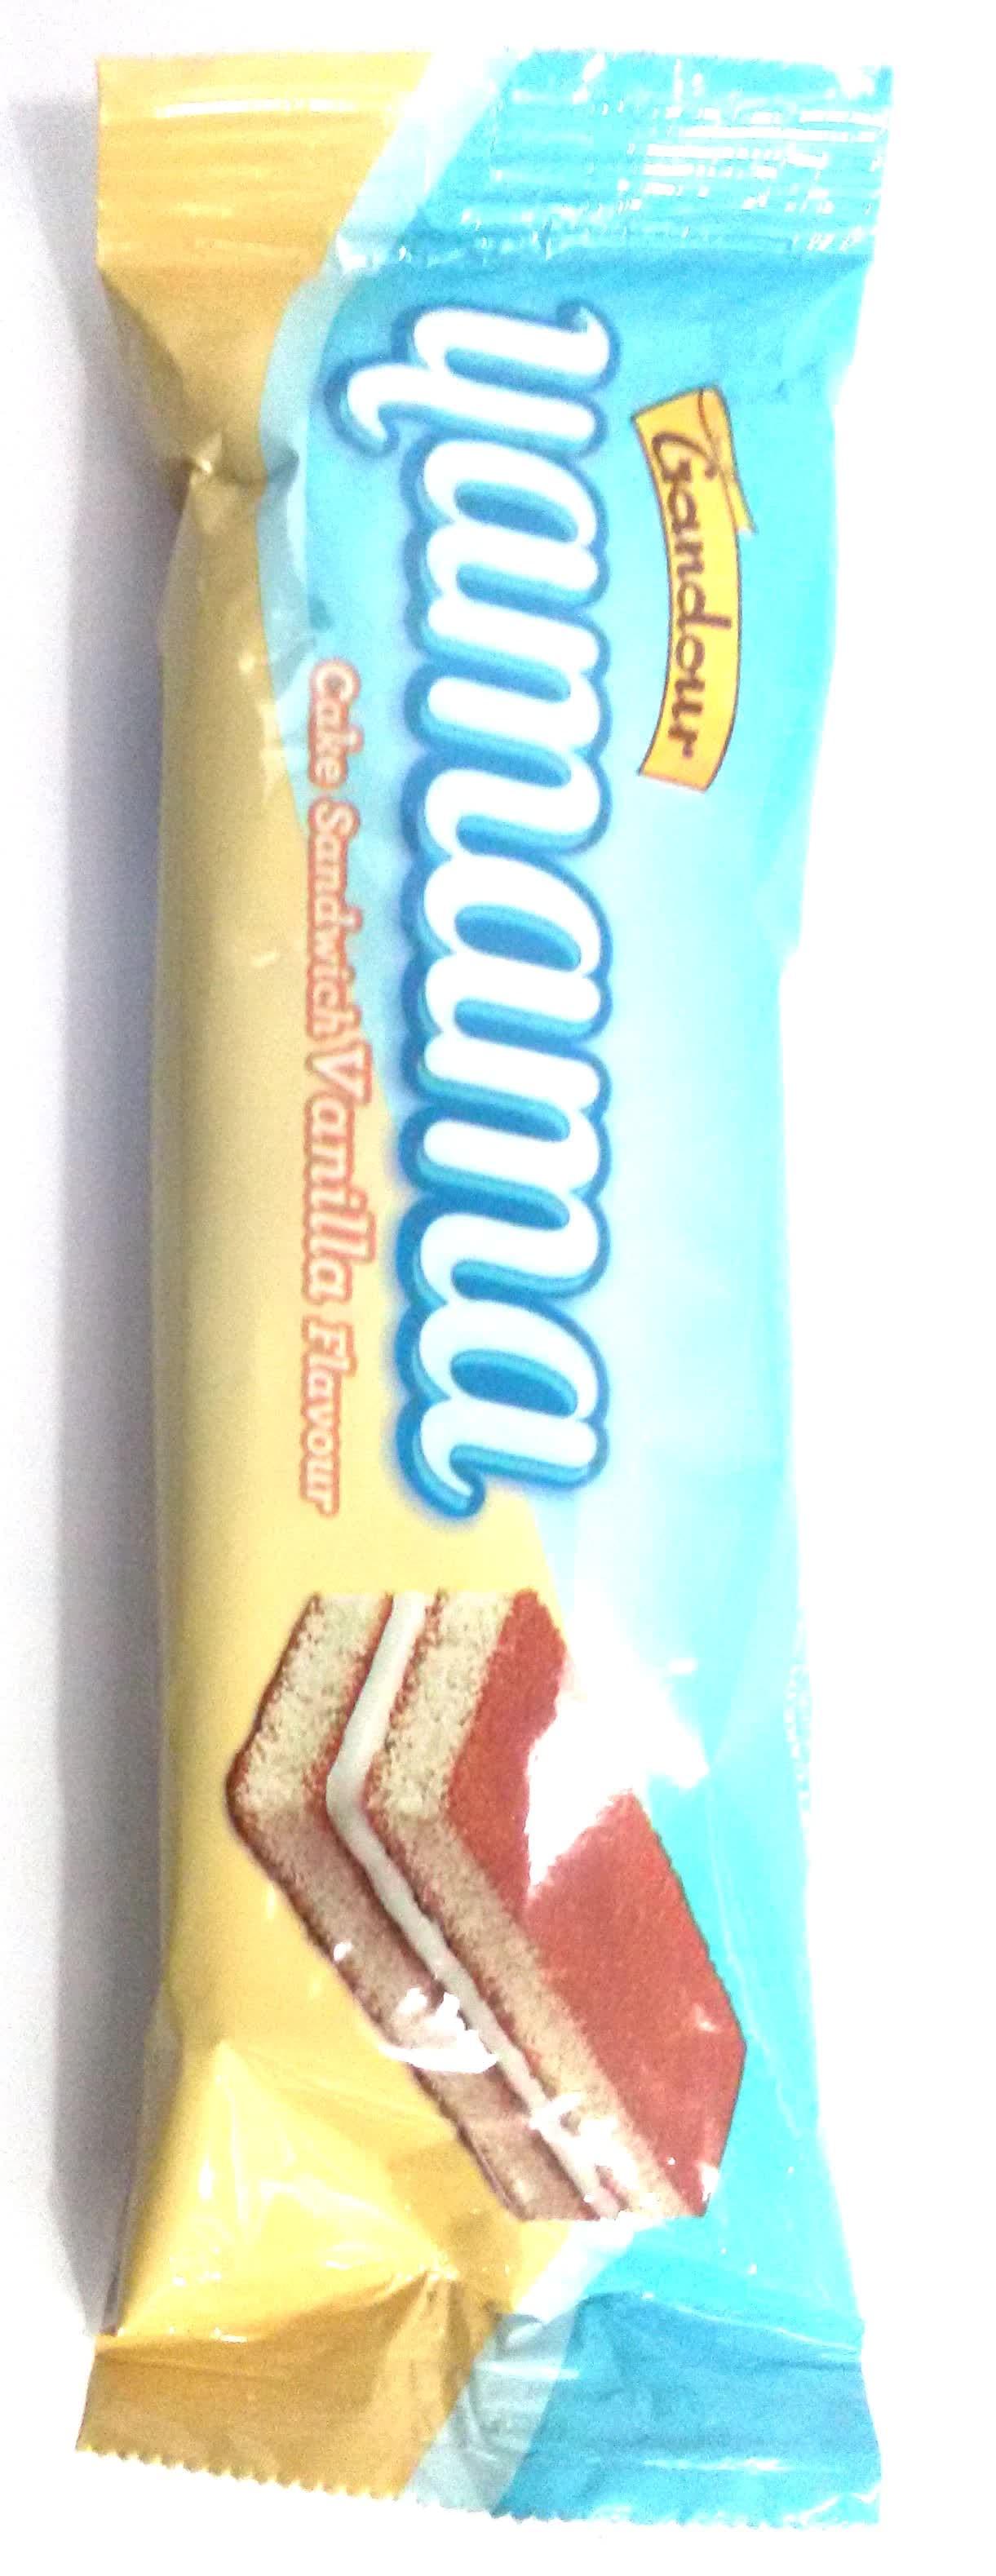 Gandour Yamama Vanilla Flavour Sandwich Cake